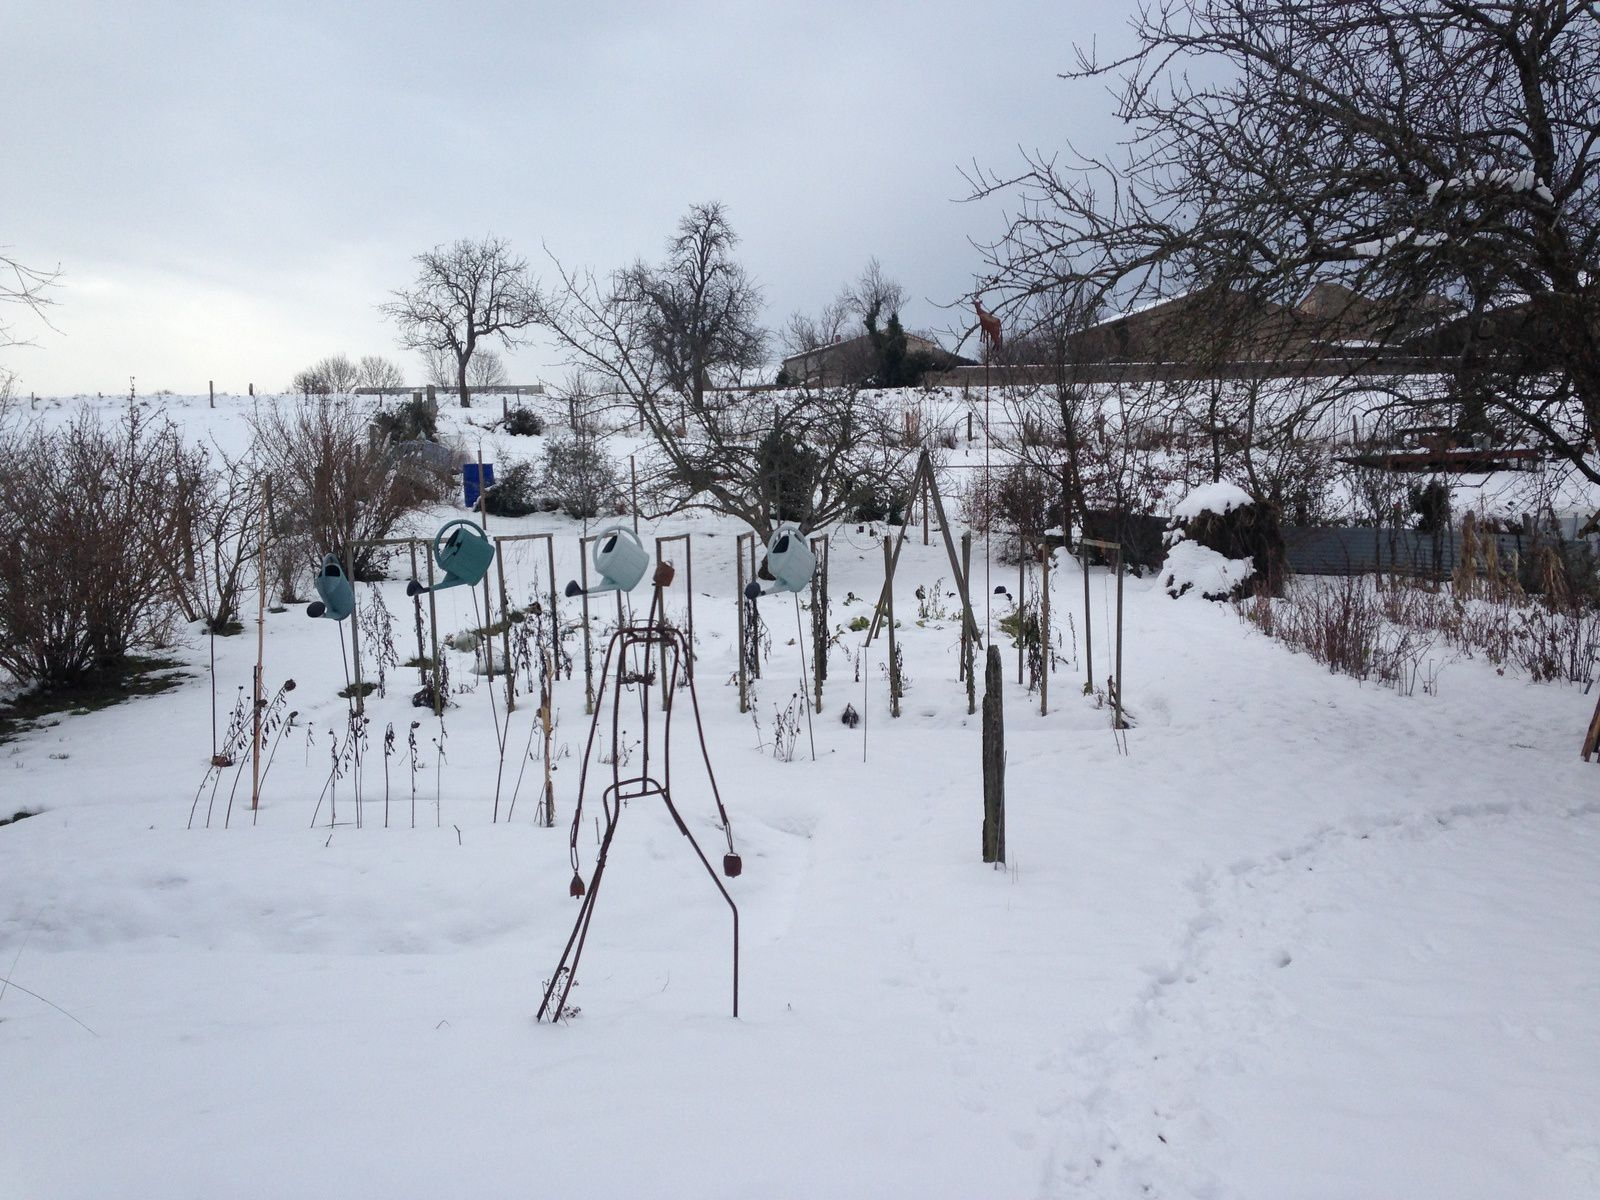 #jardin #hiver #france #charlotteblabla